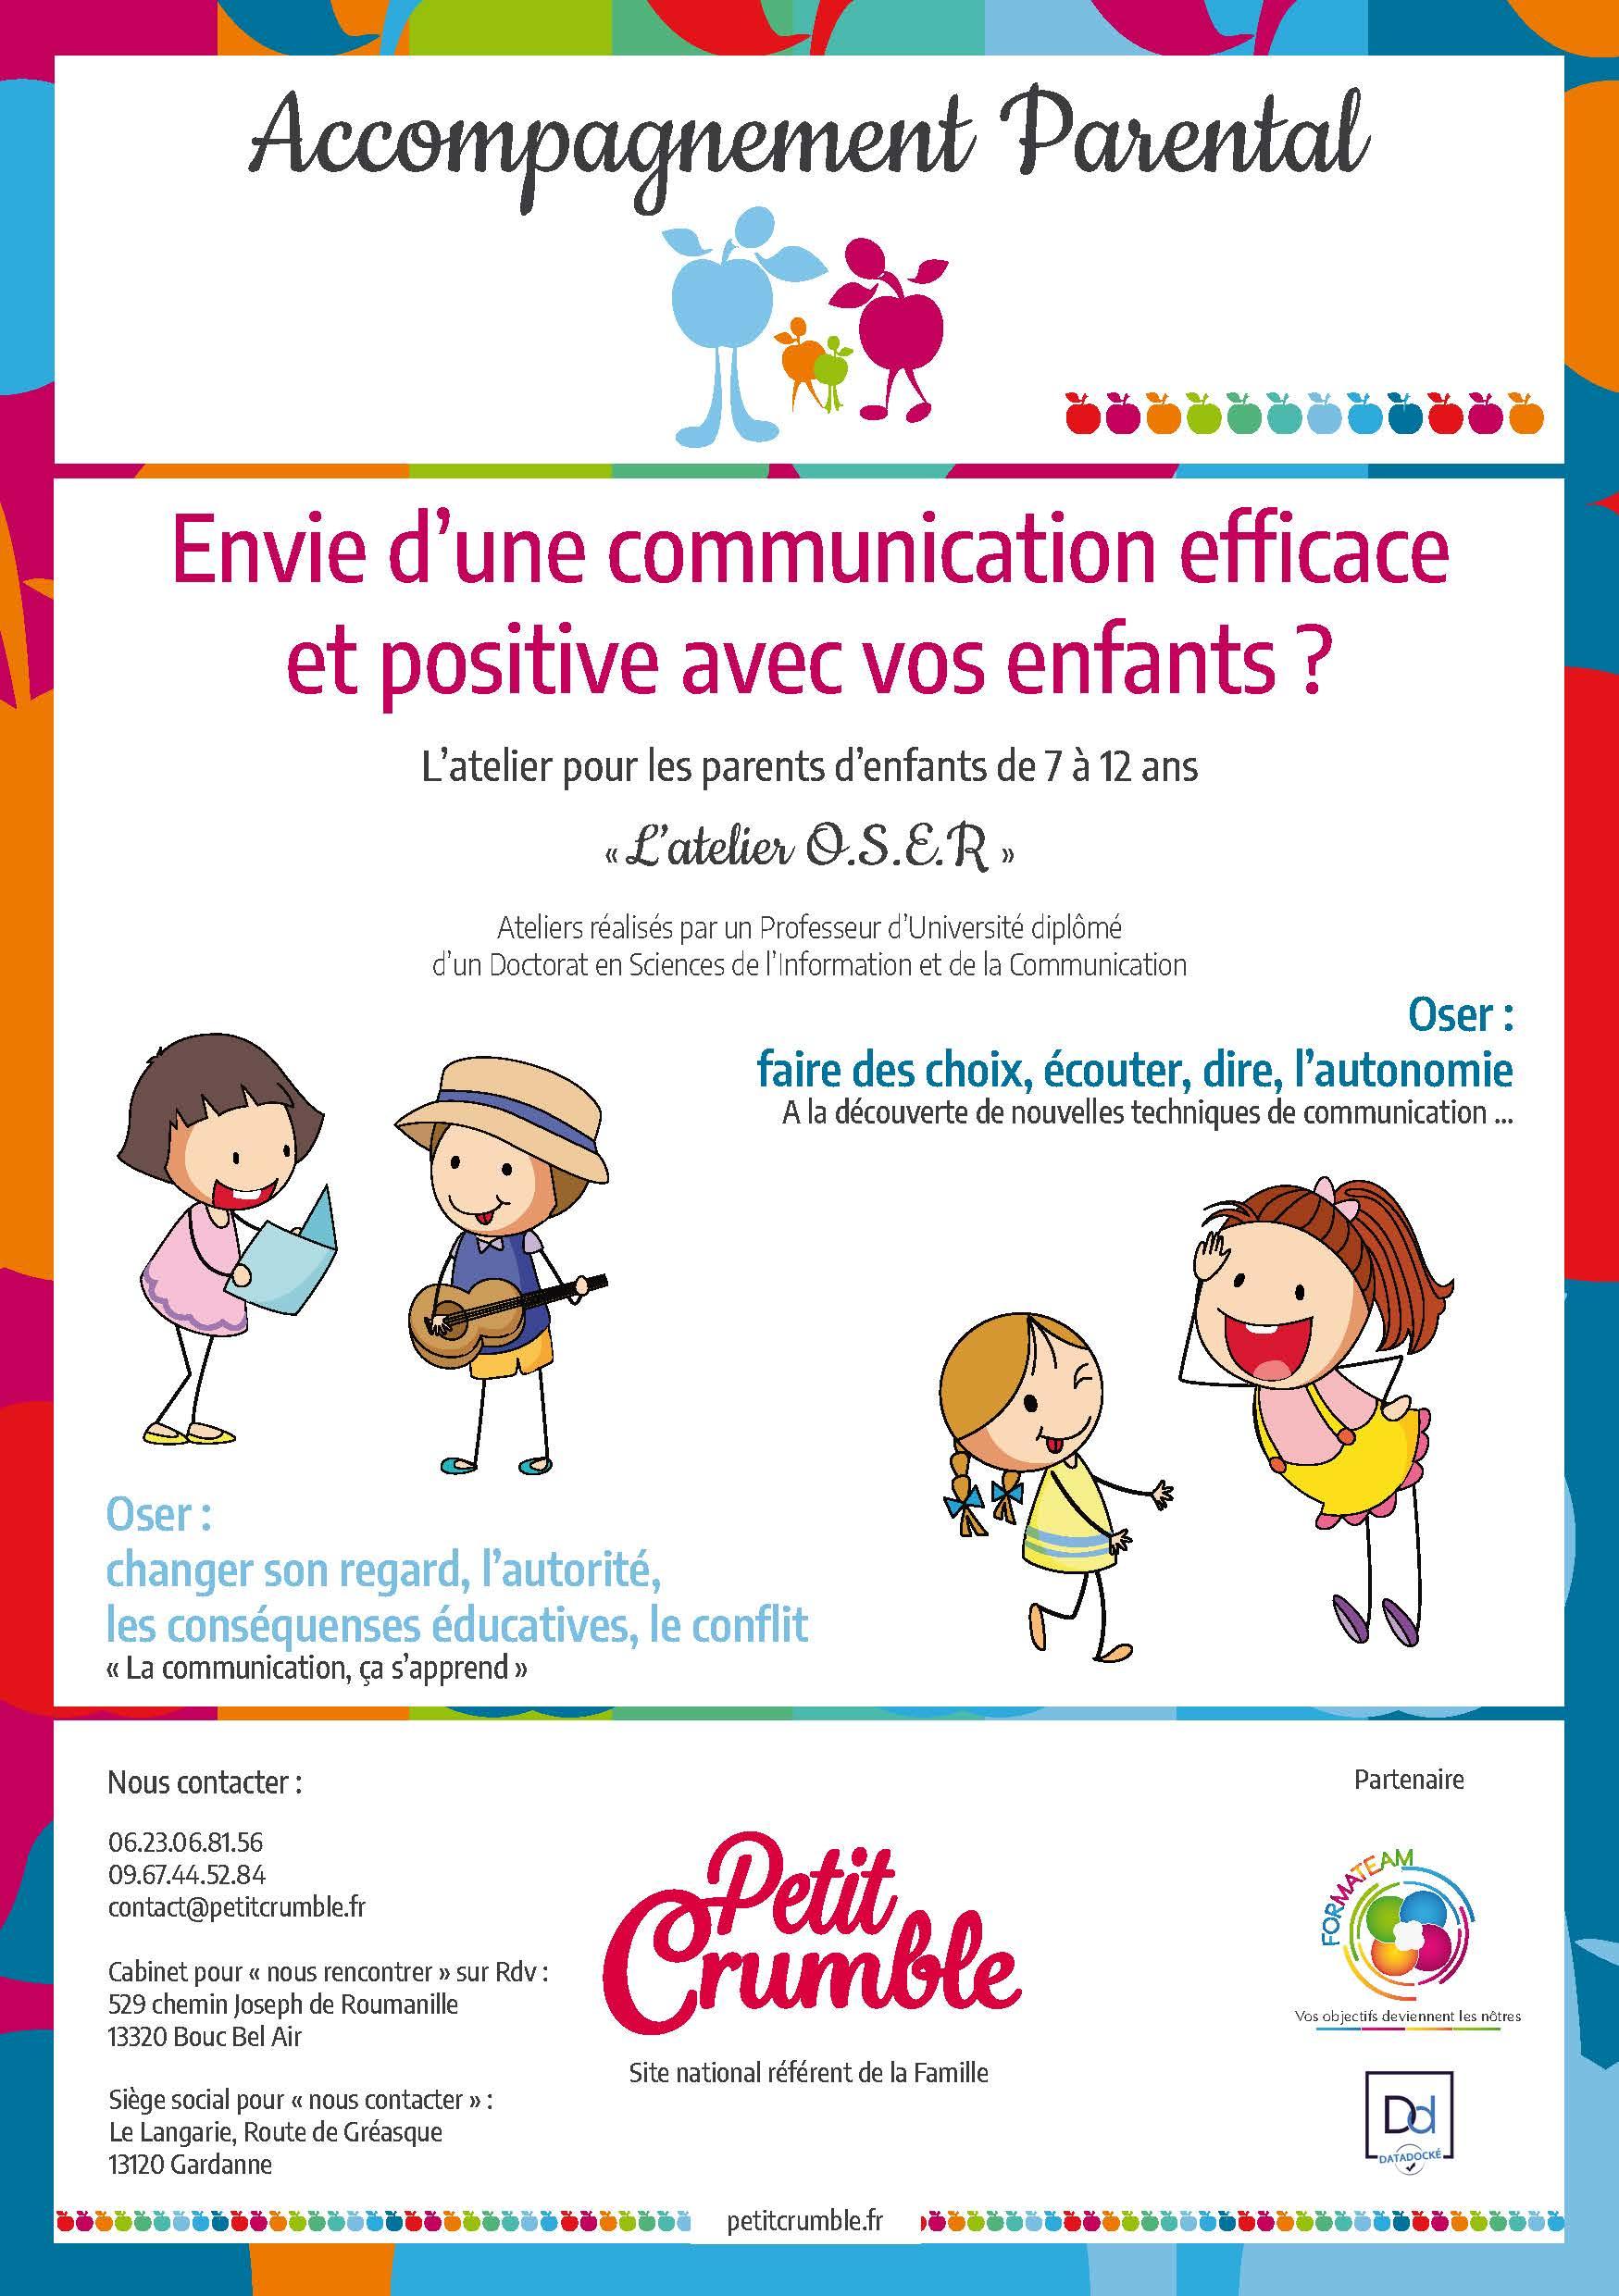 ACCOMPAGNEMENT-PARENTAL-7-10-1-min